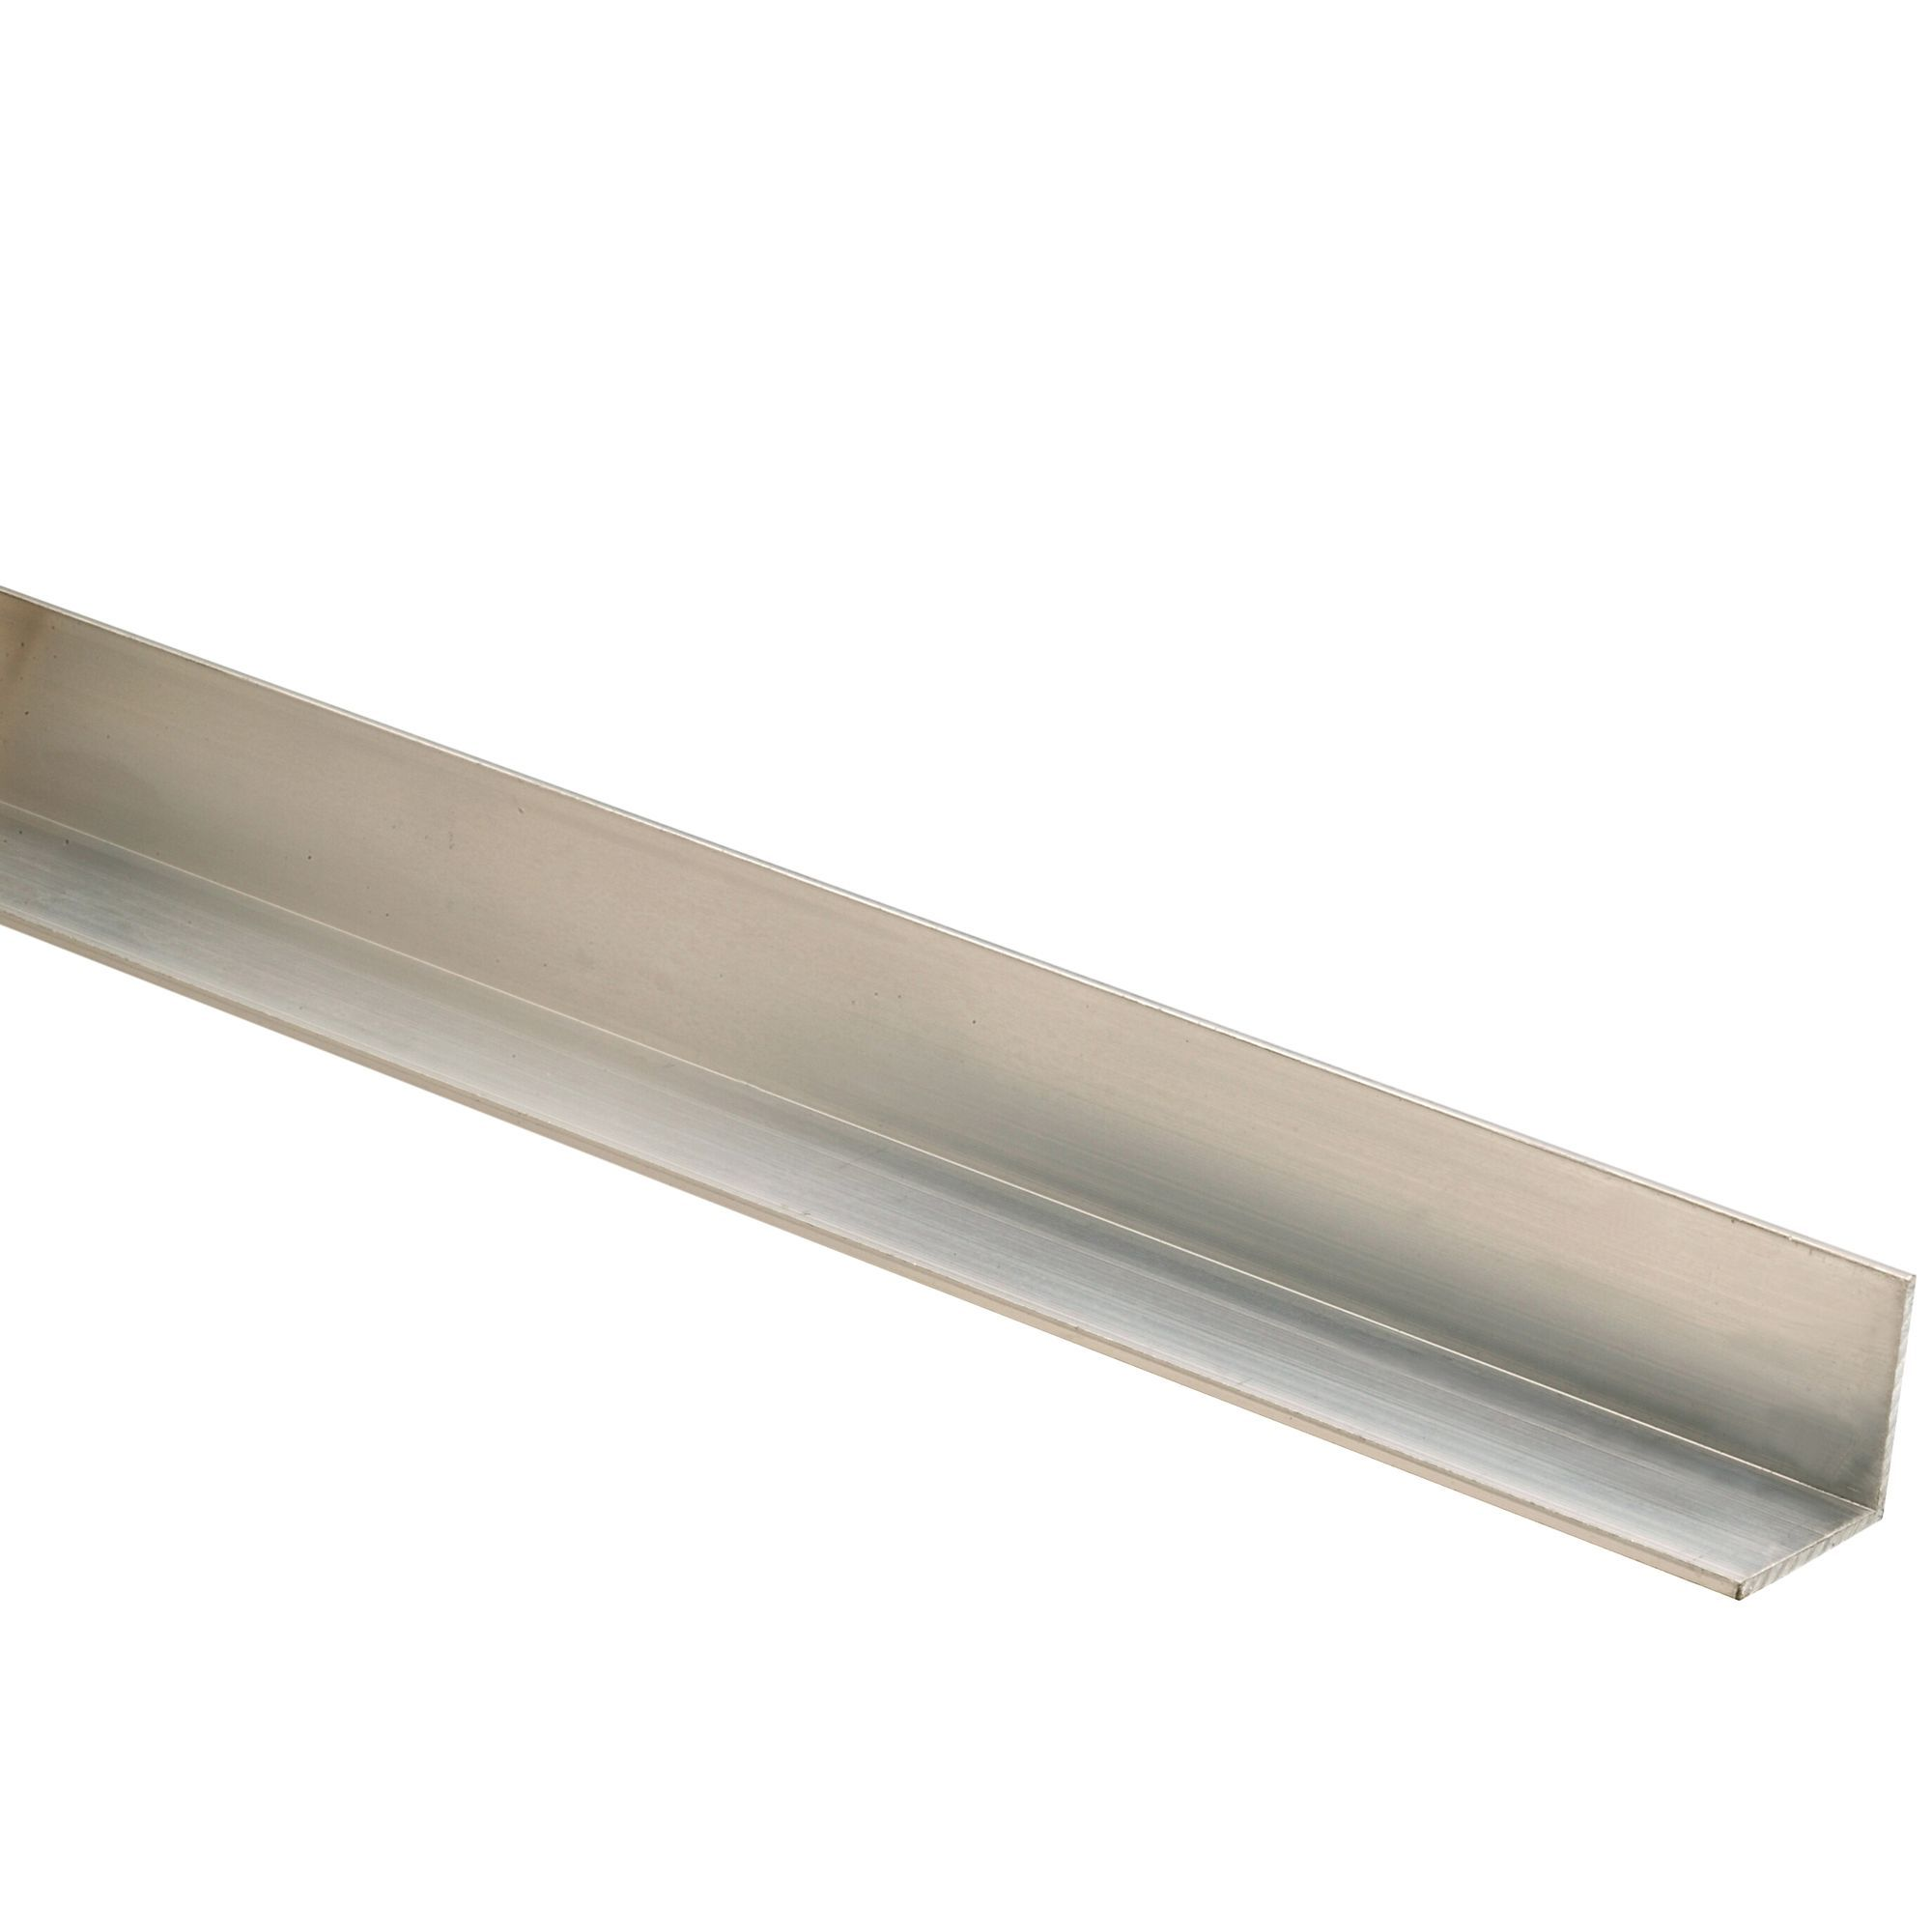 Richard Burbidge Aluminium Angle Moulding (W)18mm (L)2 4m (T)18mm